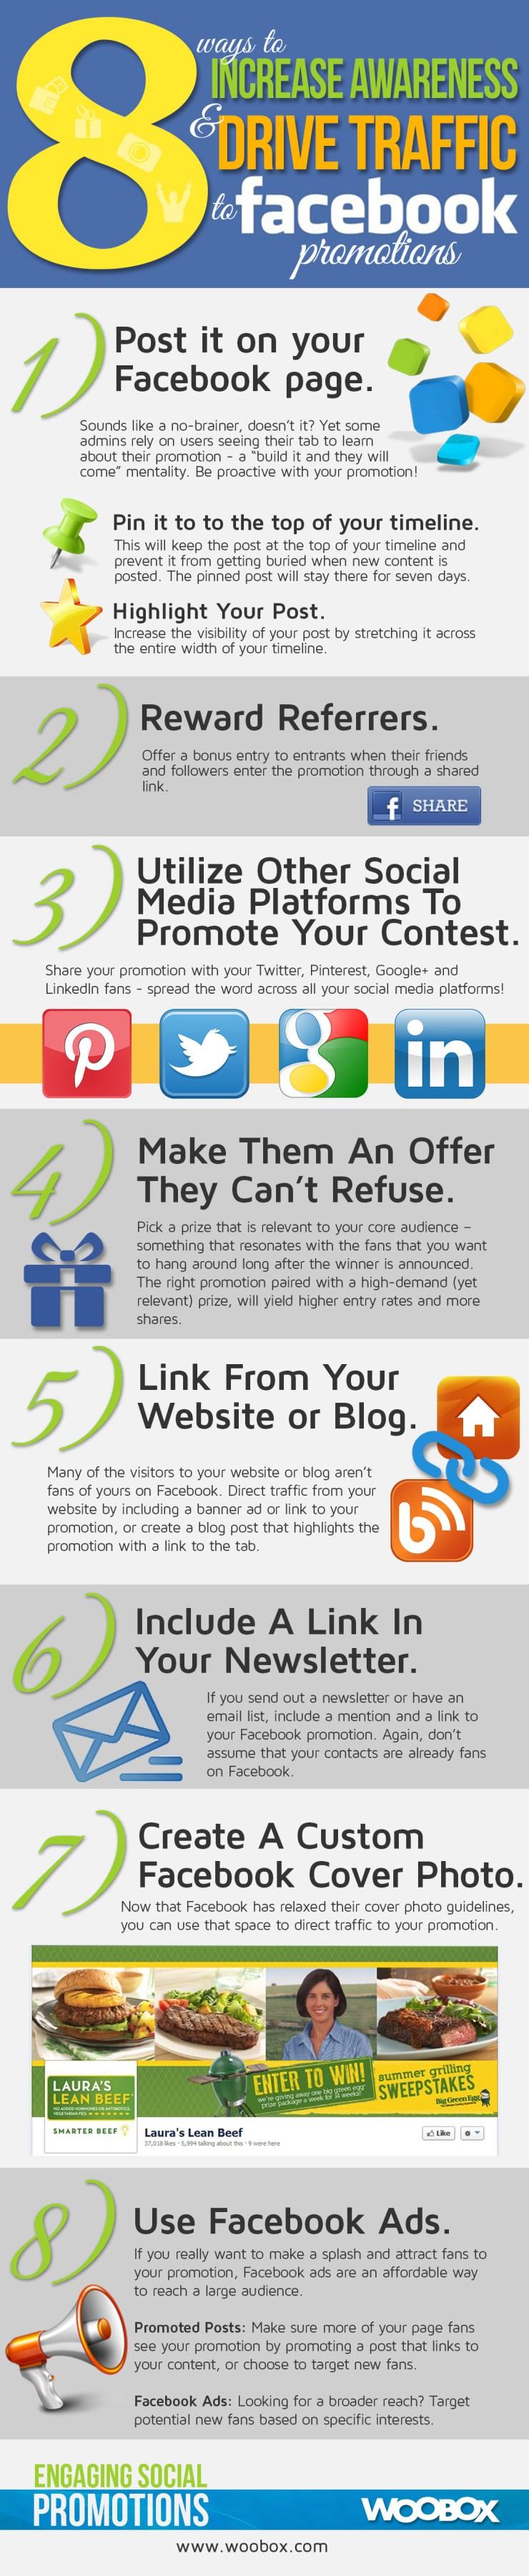 8-ways-to-increase-promotion-awareness